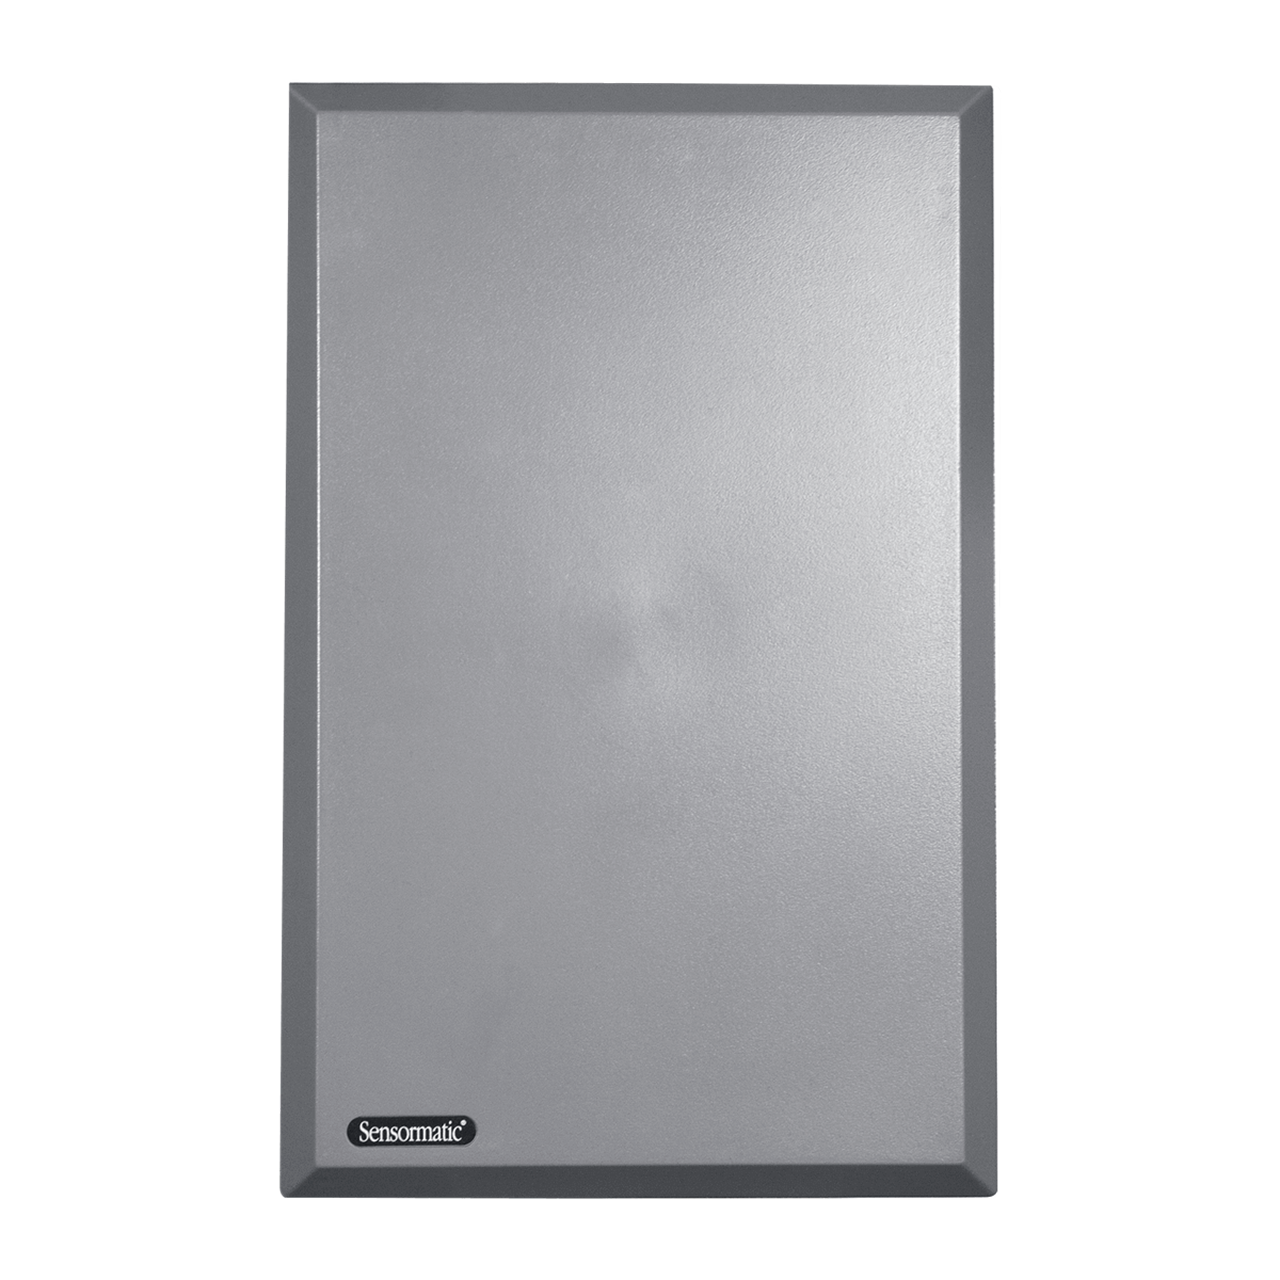 Sensormatic Low Profile Pad Deactivator in Armenia Vantag LLC